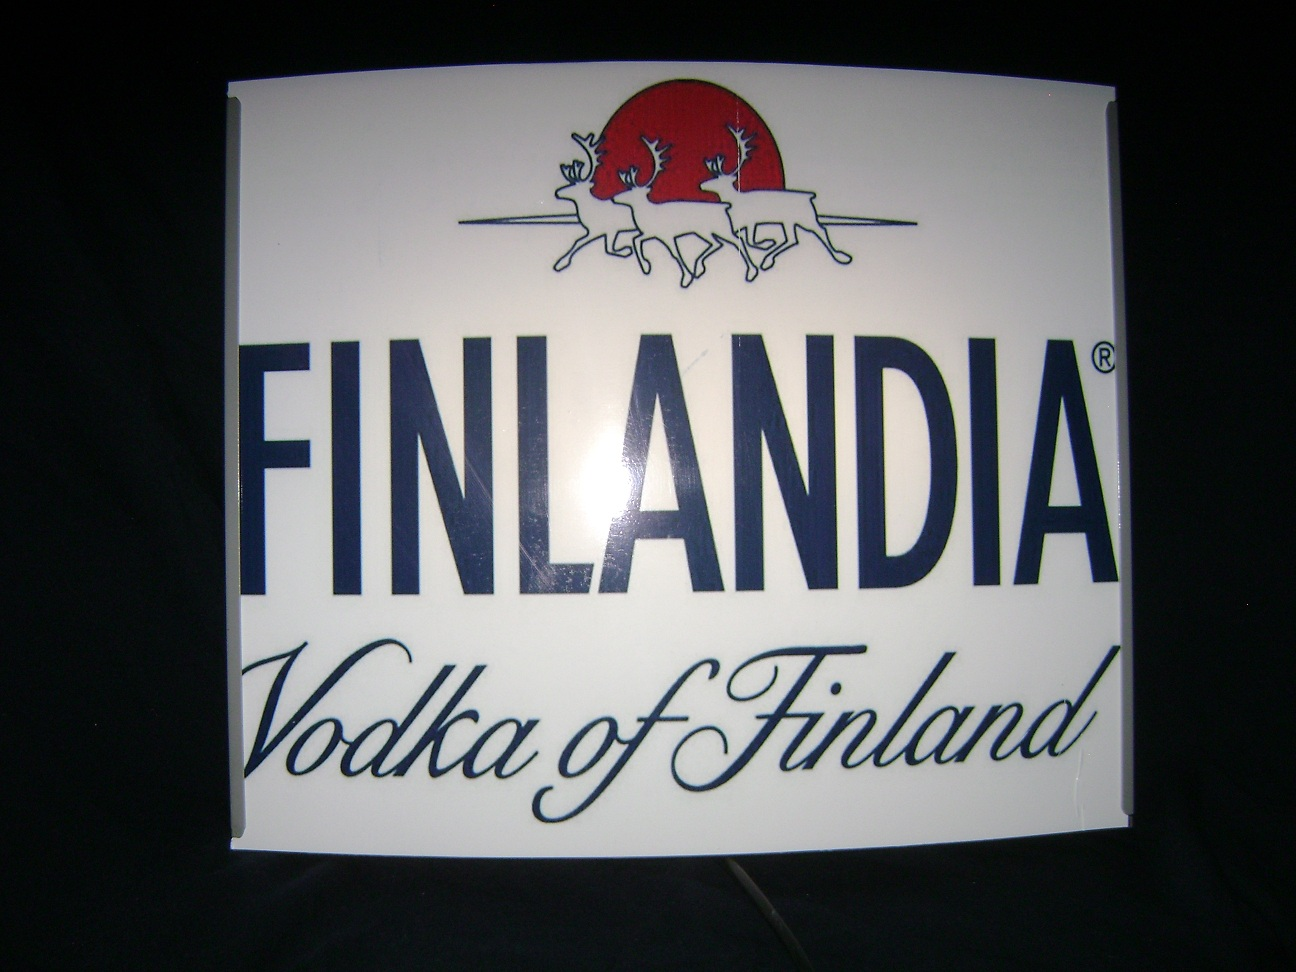 Reklama_svetleca_Finlandia_vodka_2.jpg